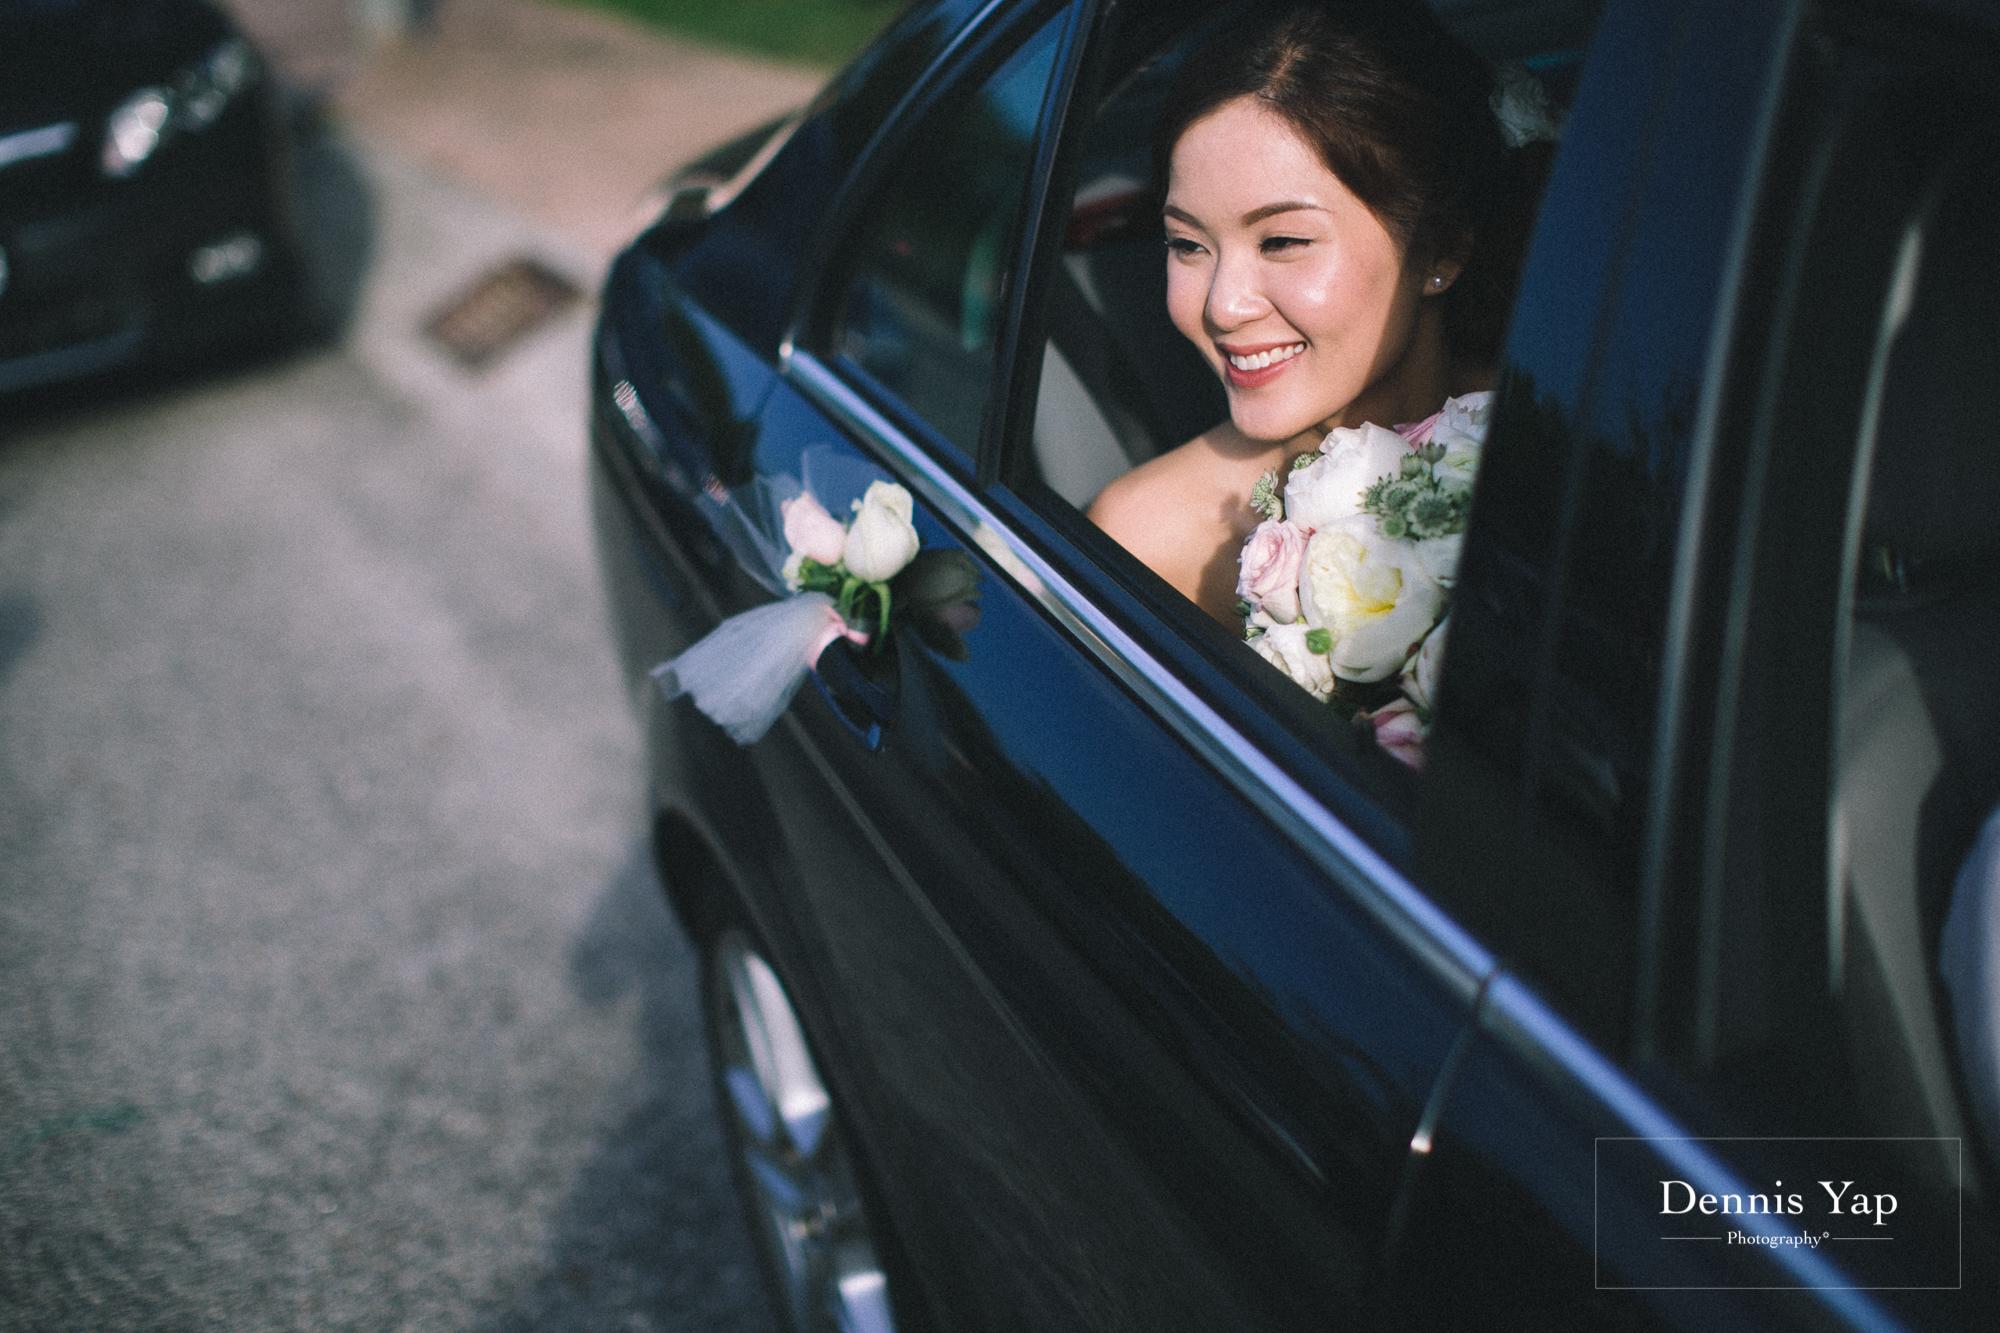 chin foo sze yin wedding day botanic klang club house dennis yap photography-14.jpg